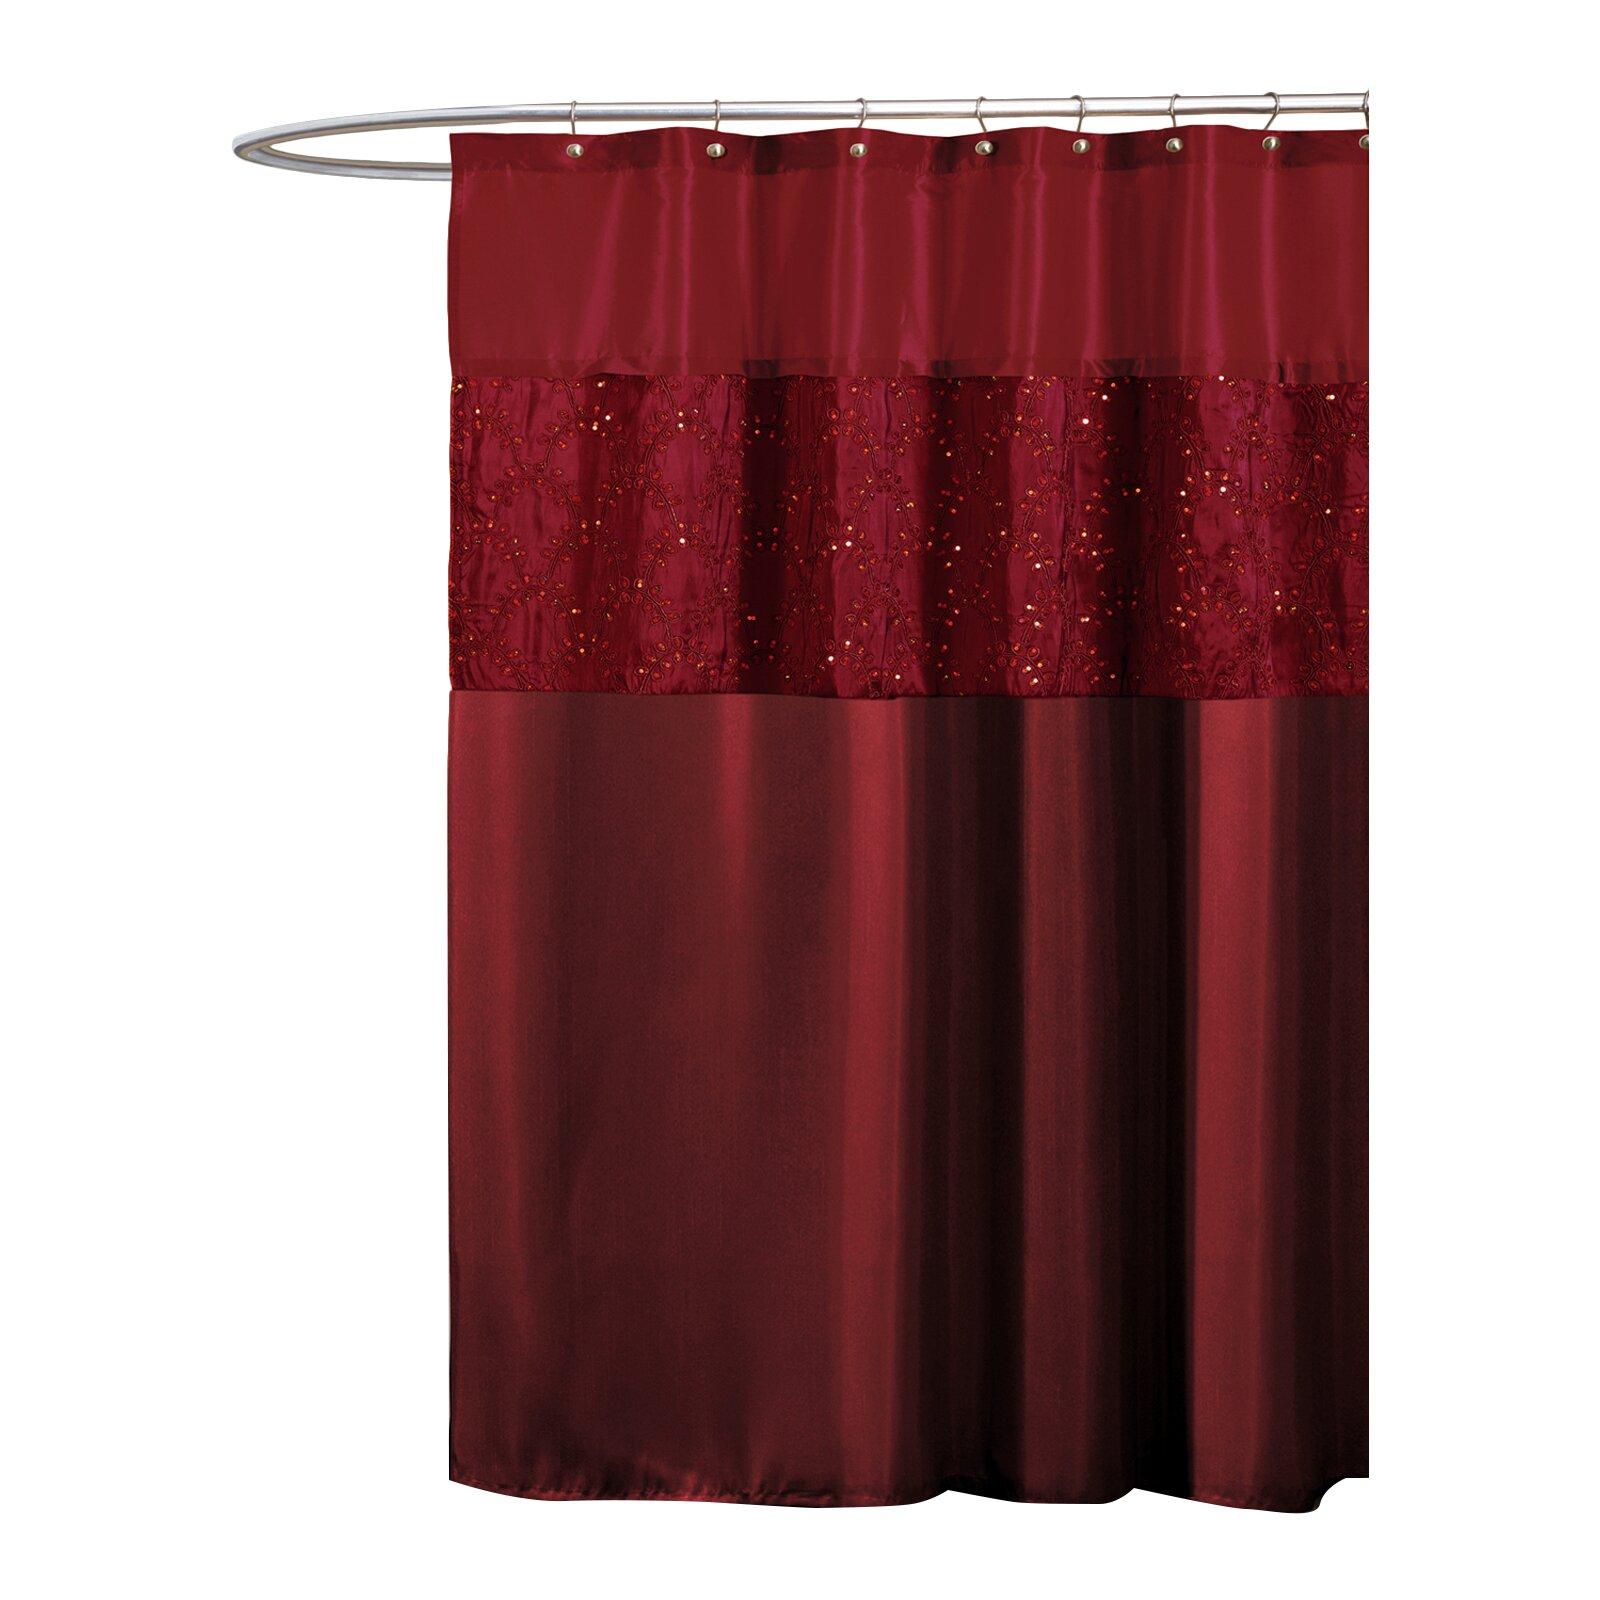 Red shower curtain - Riya Shower Curtain